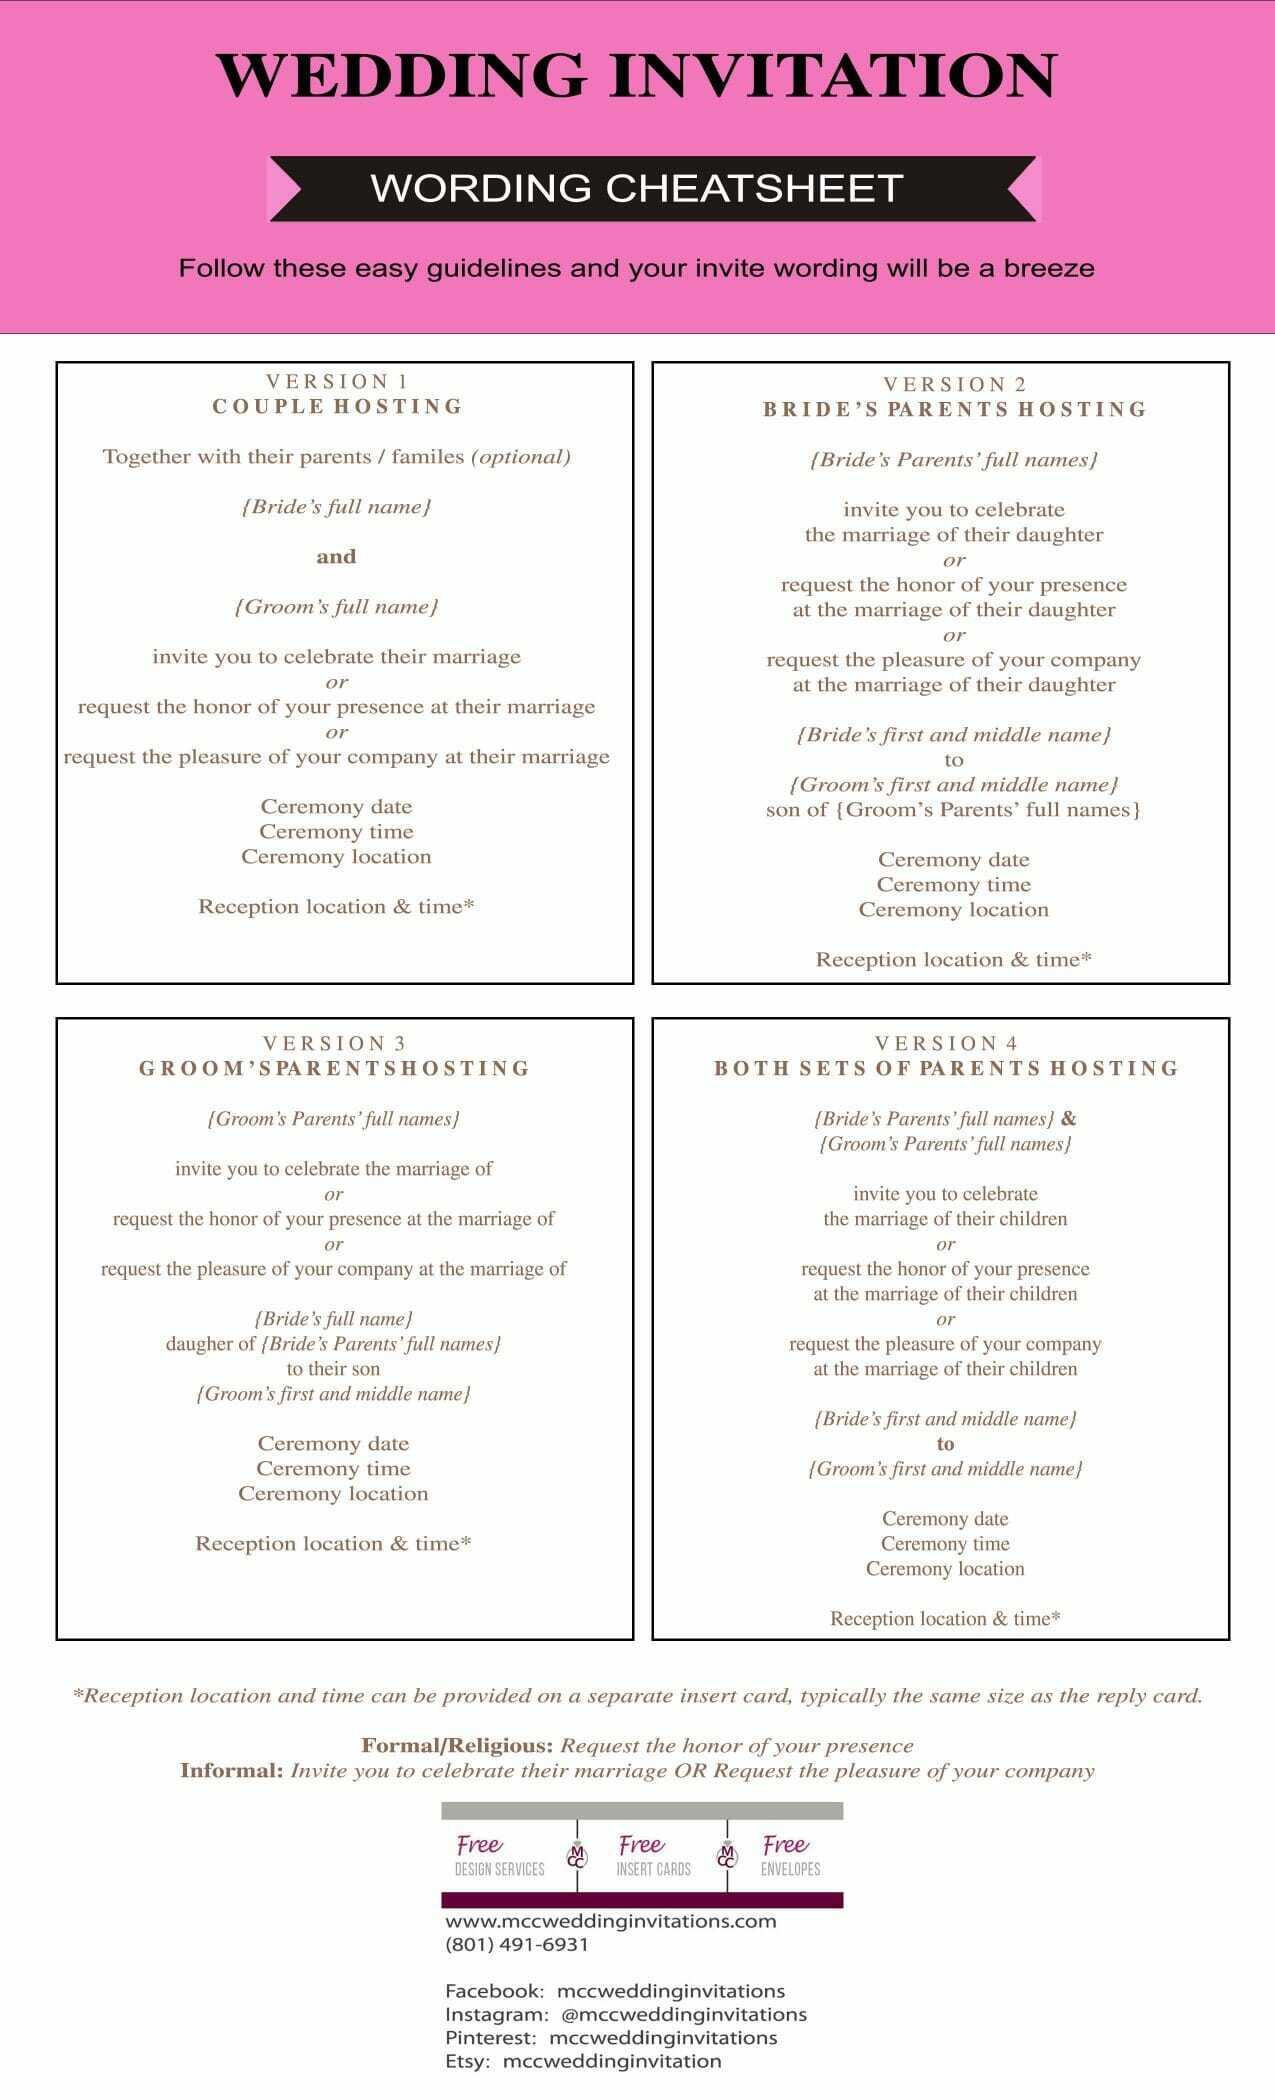 Wedding Invitation Etiquette Guide 1